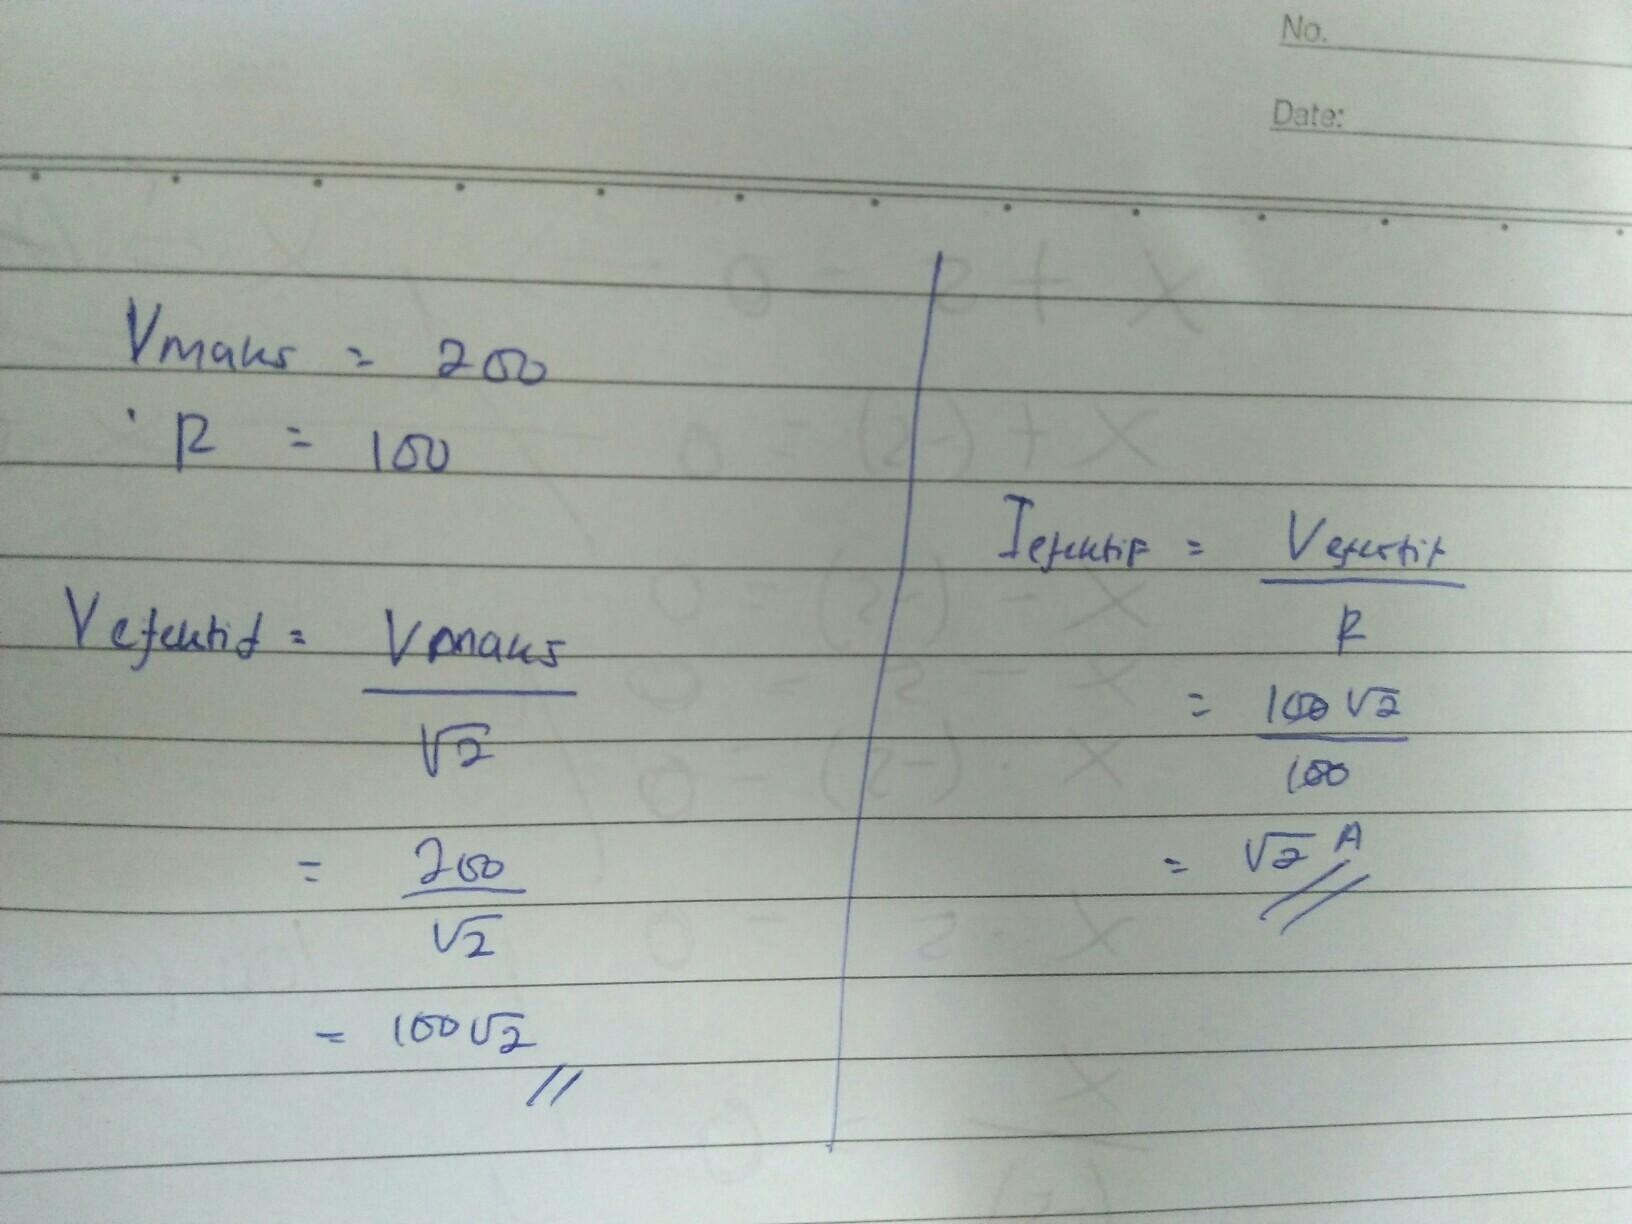 Sebuah Generator Ac Menghasilkan Tegangan Yang Memenuhi Persamaan V